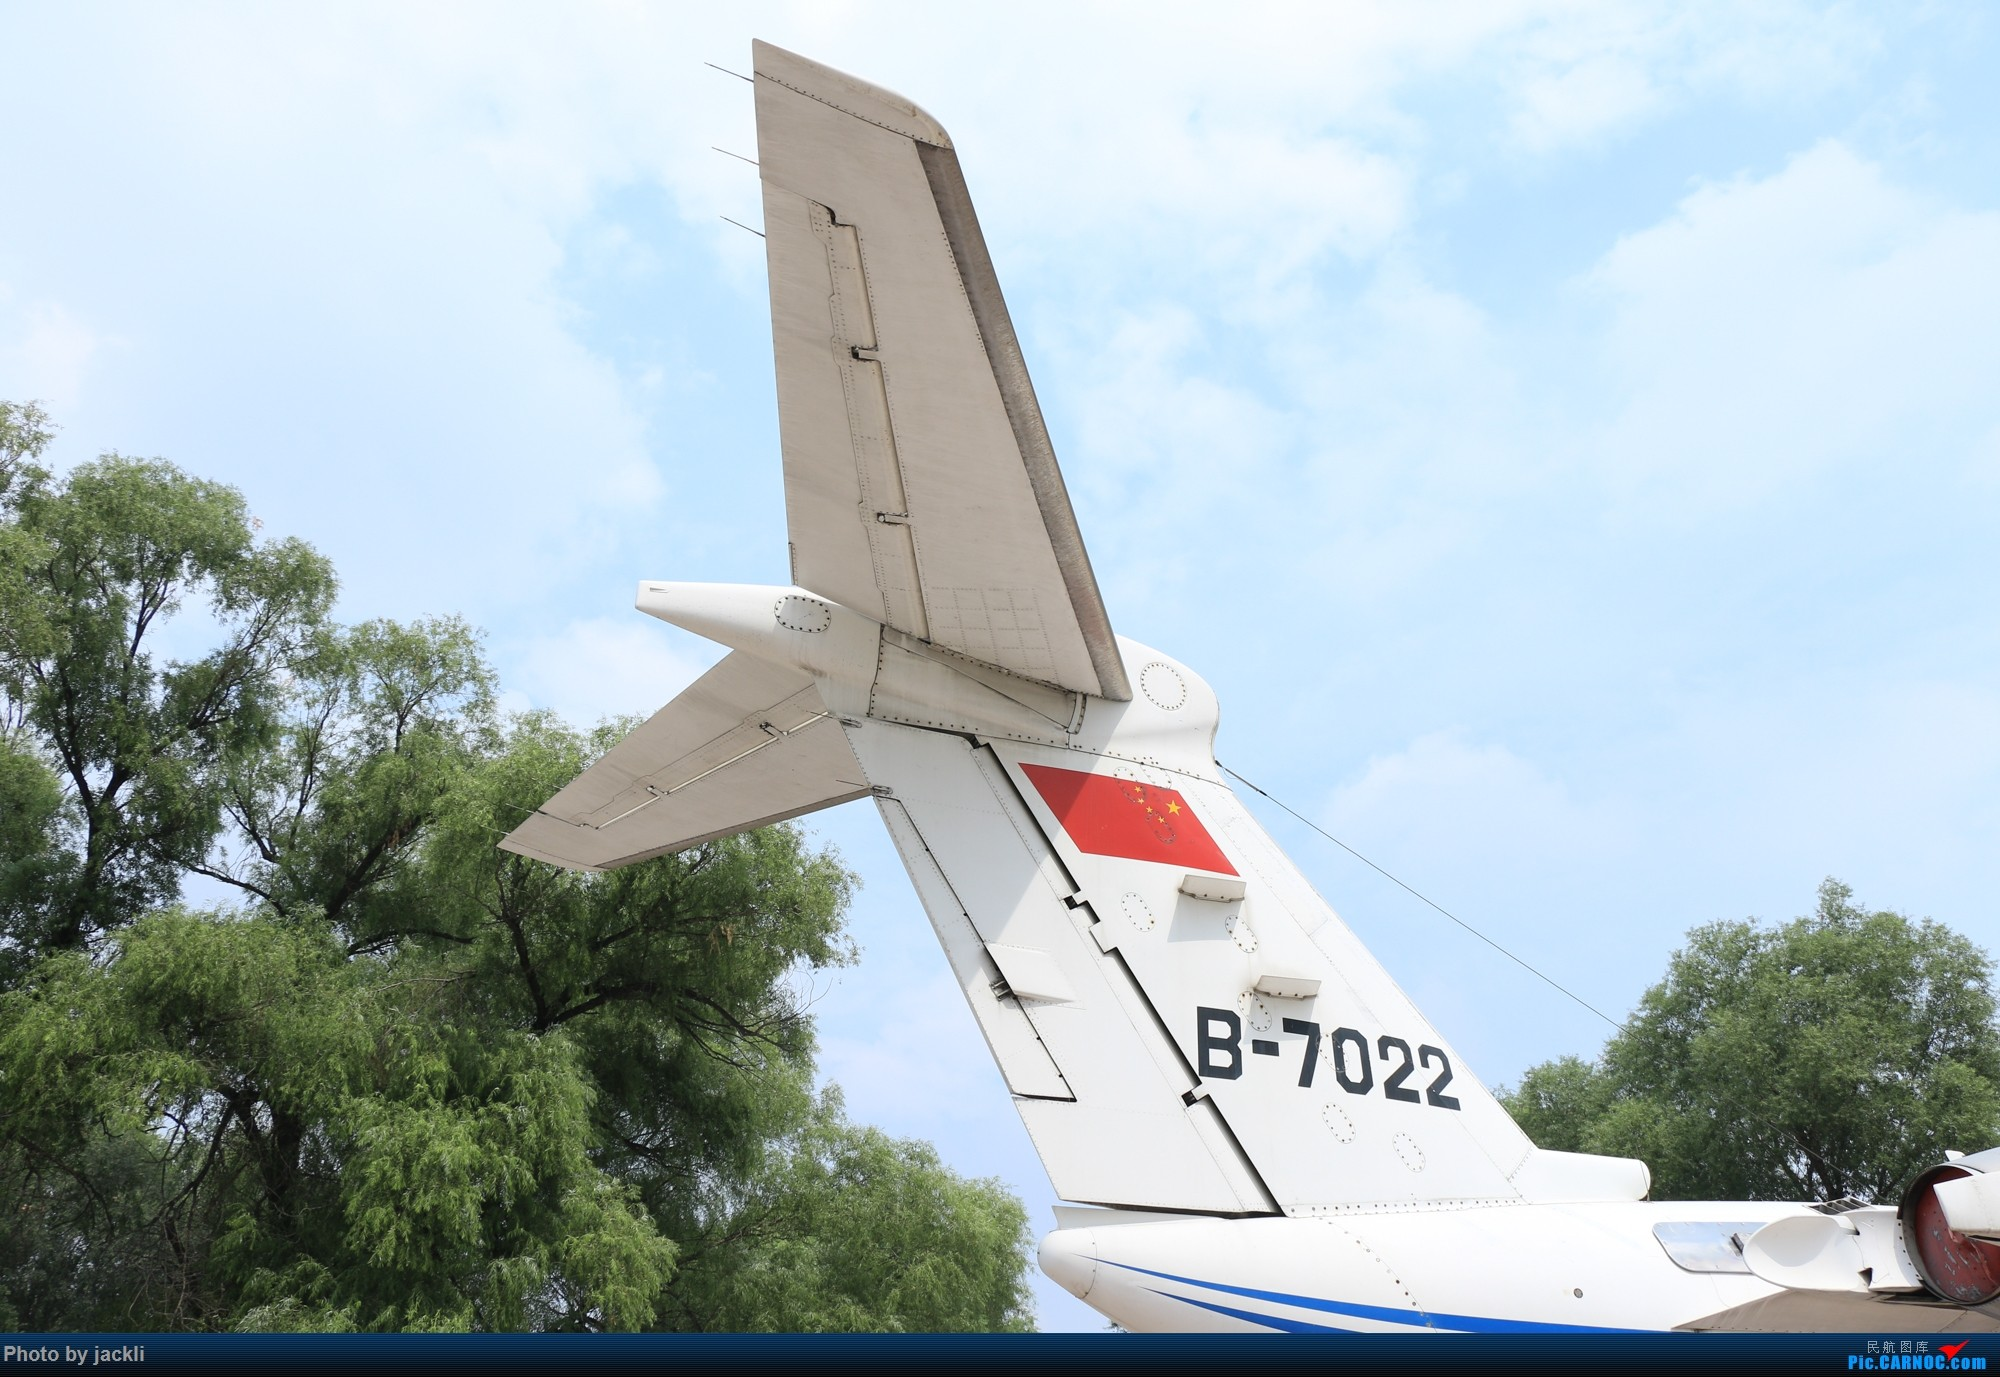 Re:[原创]【JackLi拍机+游记】北京首都机场拍机+参观民航博物馆+首次体验国航A350~ CESSNA 650 B-7022 民航博物馆